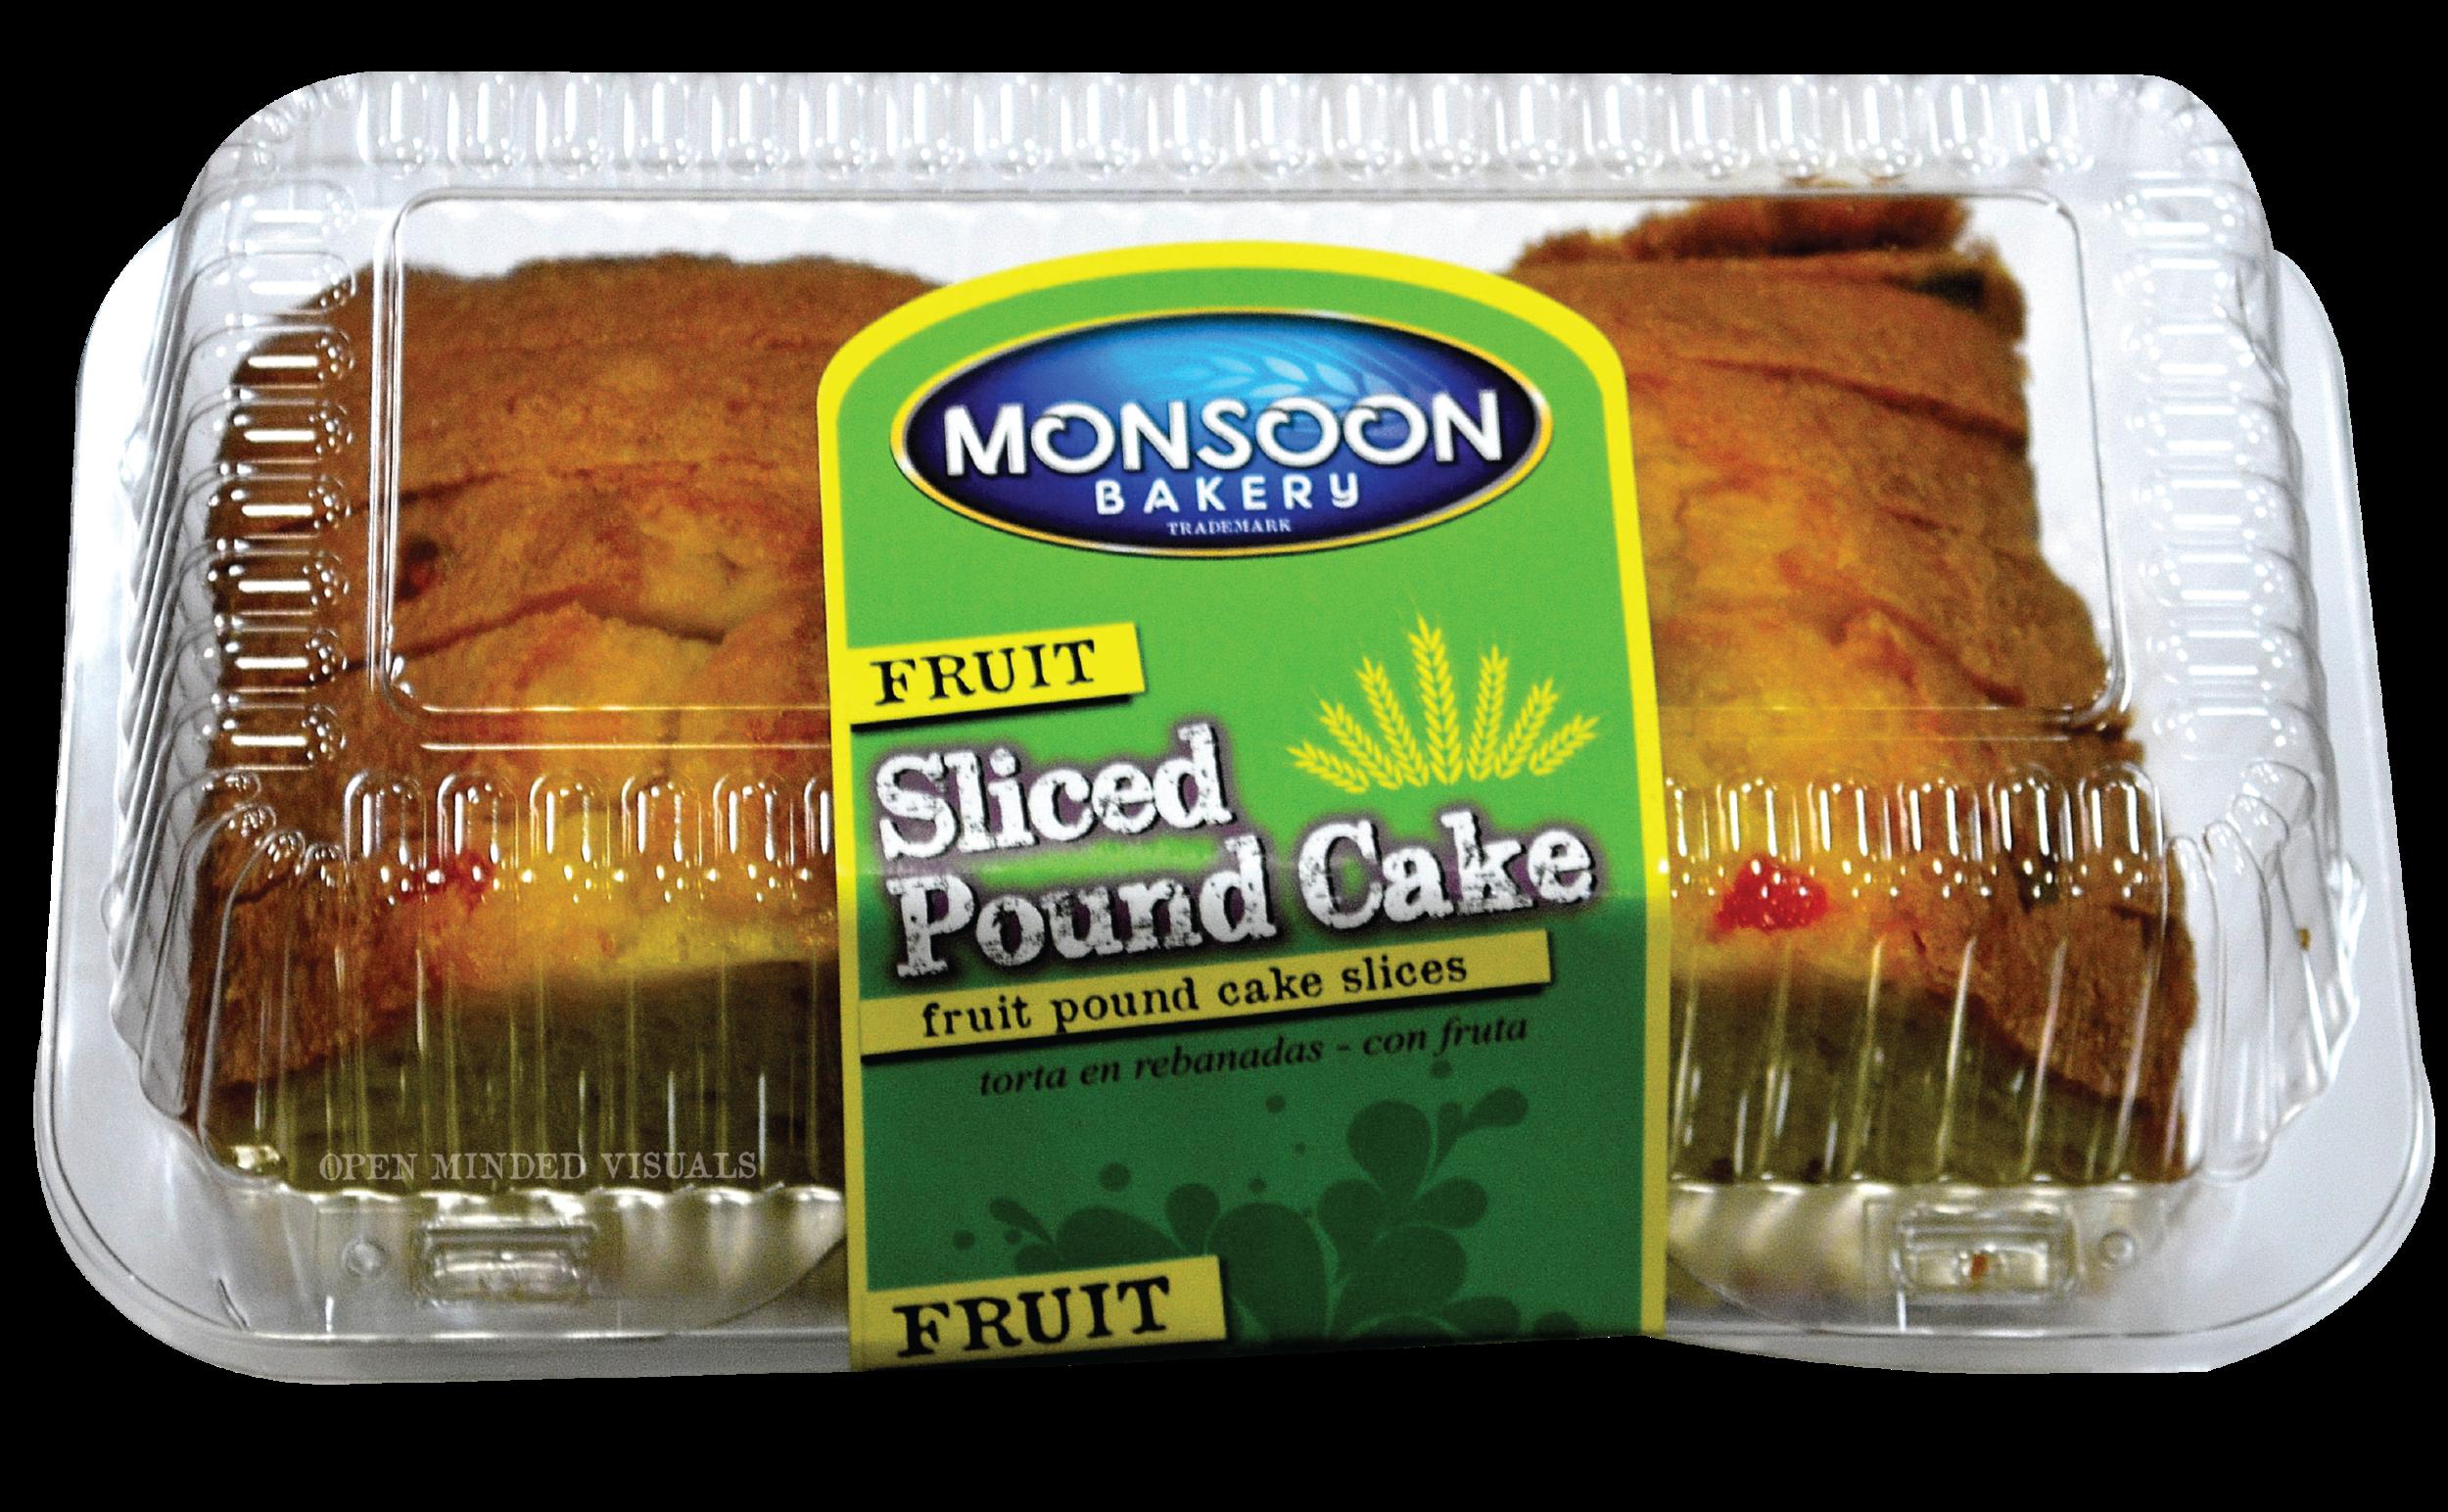 Sliced Fruit Pound Cake